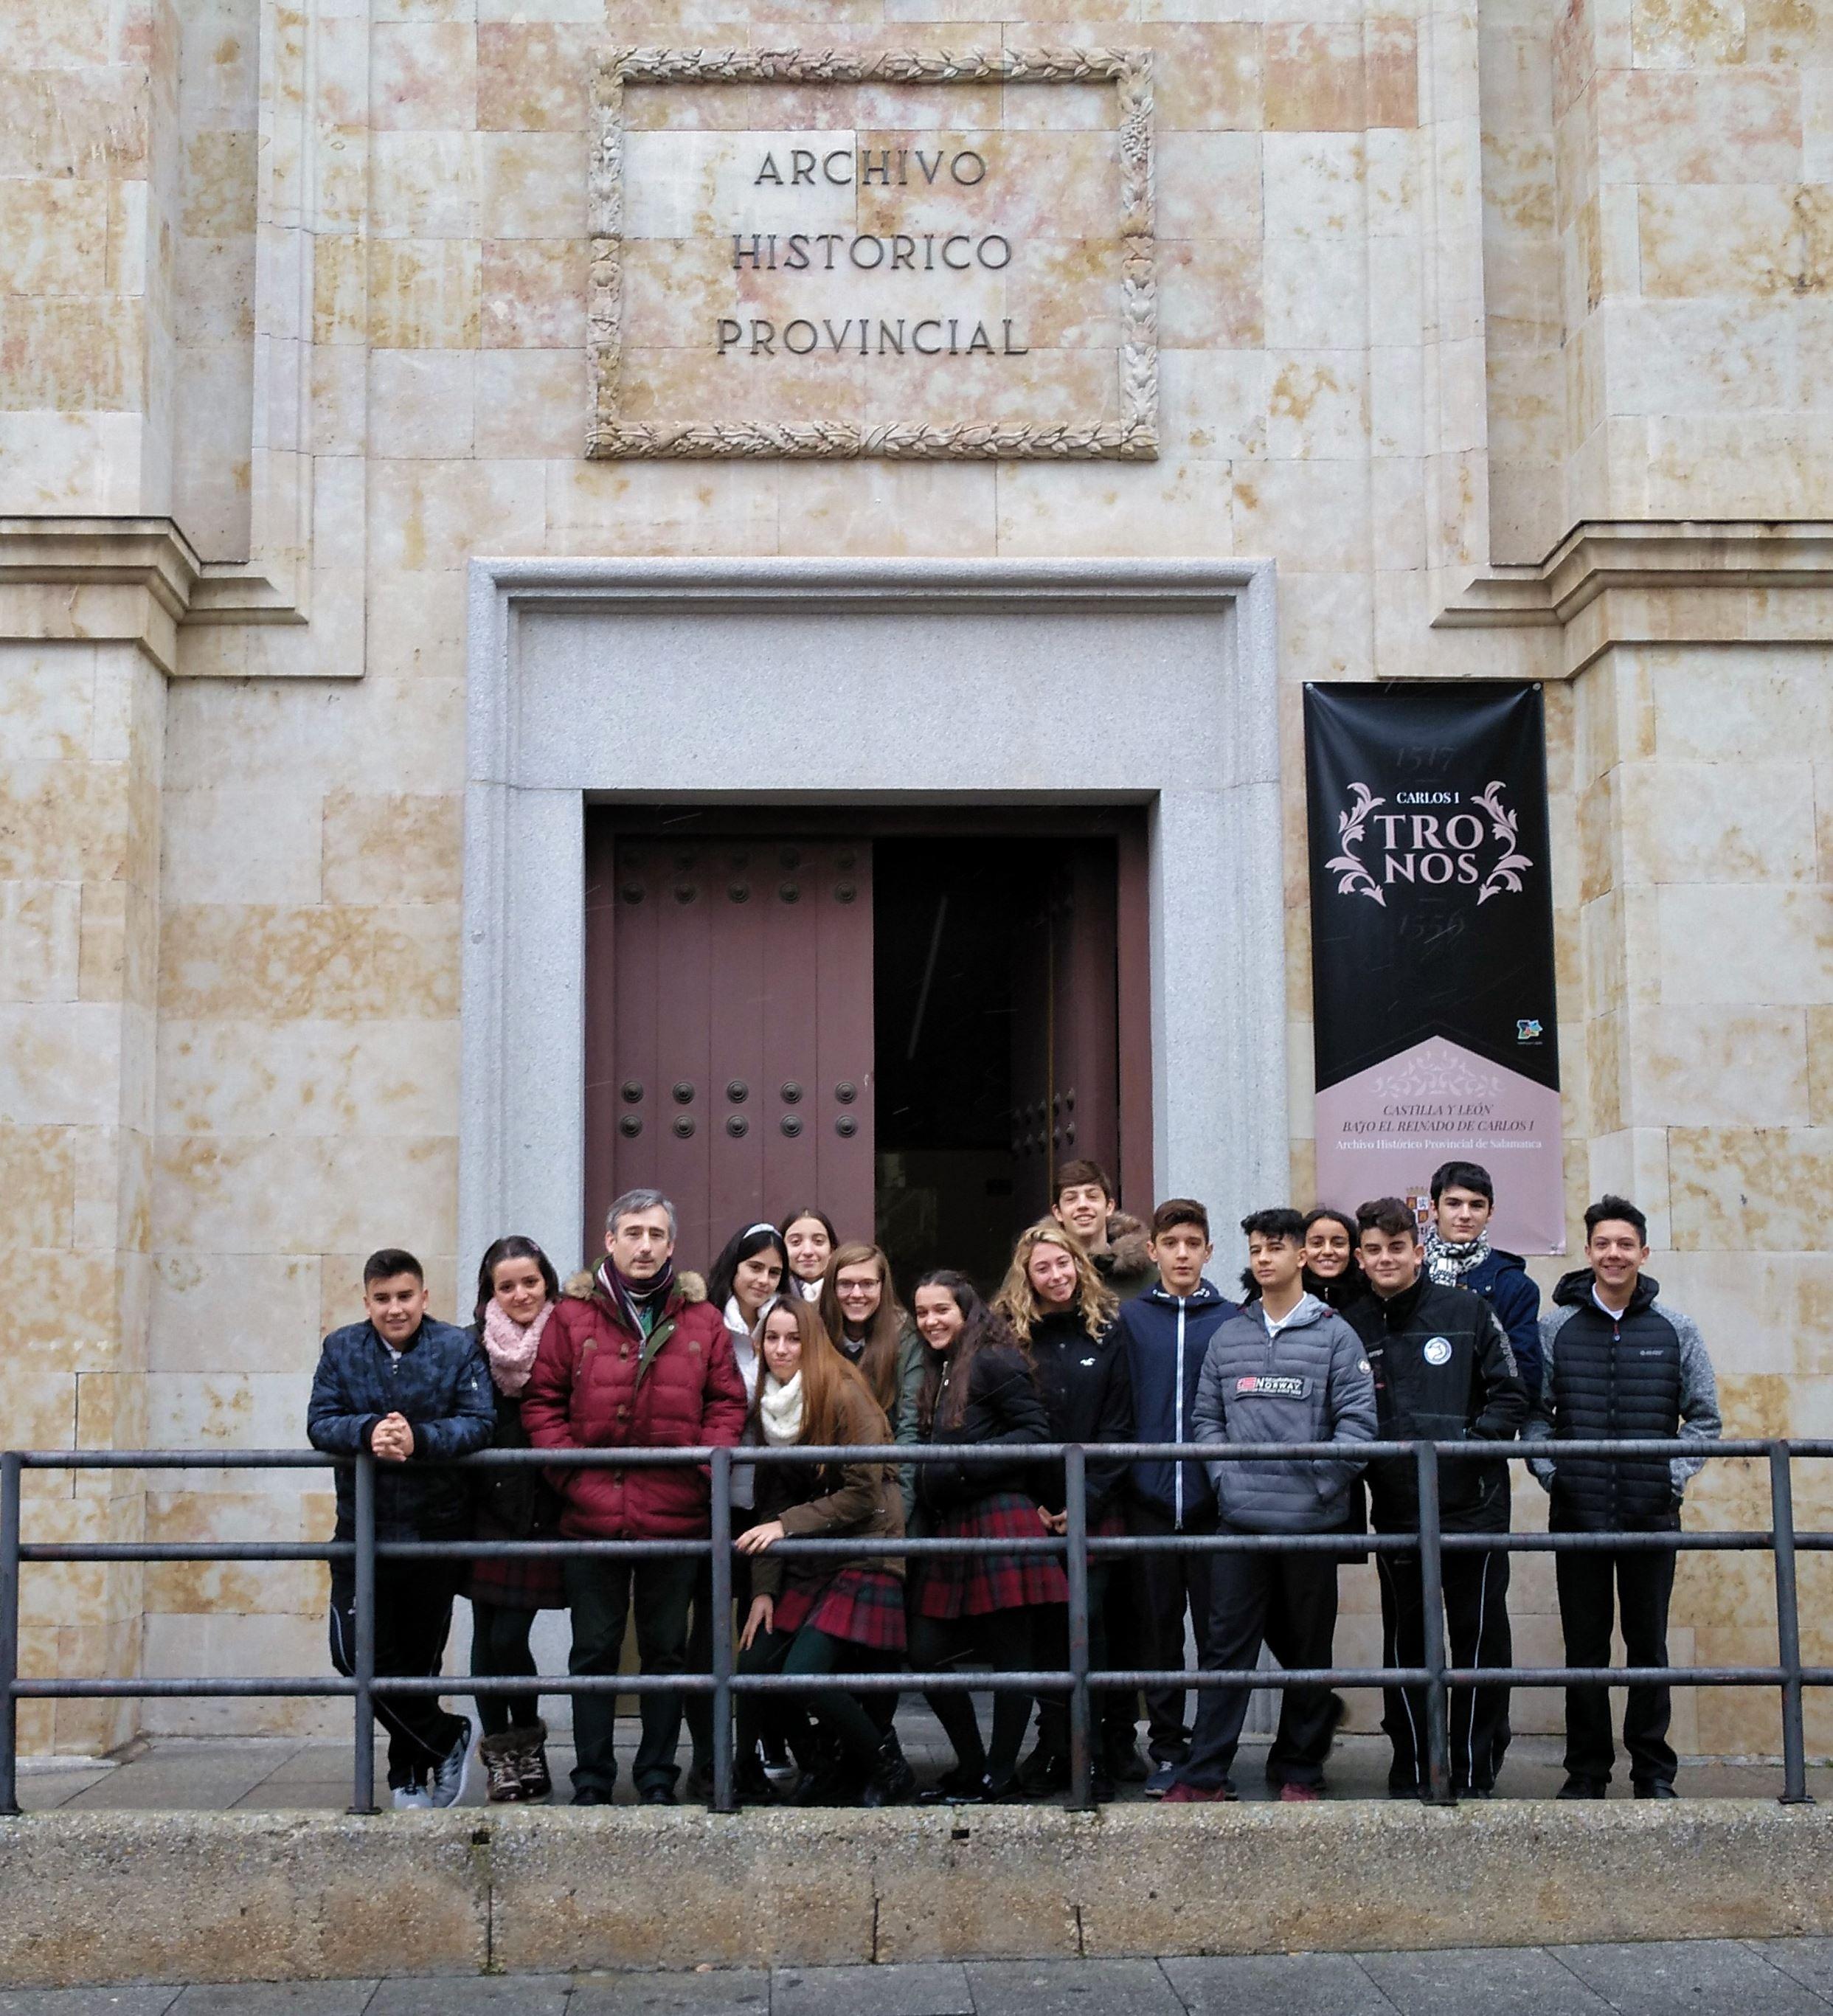 Calasanz_Archivo Provincial